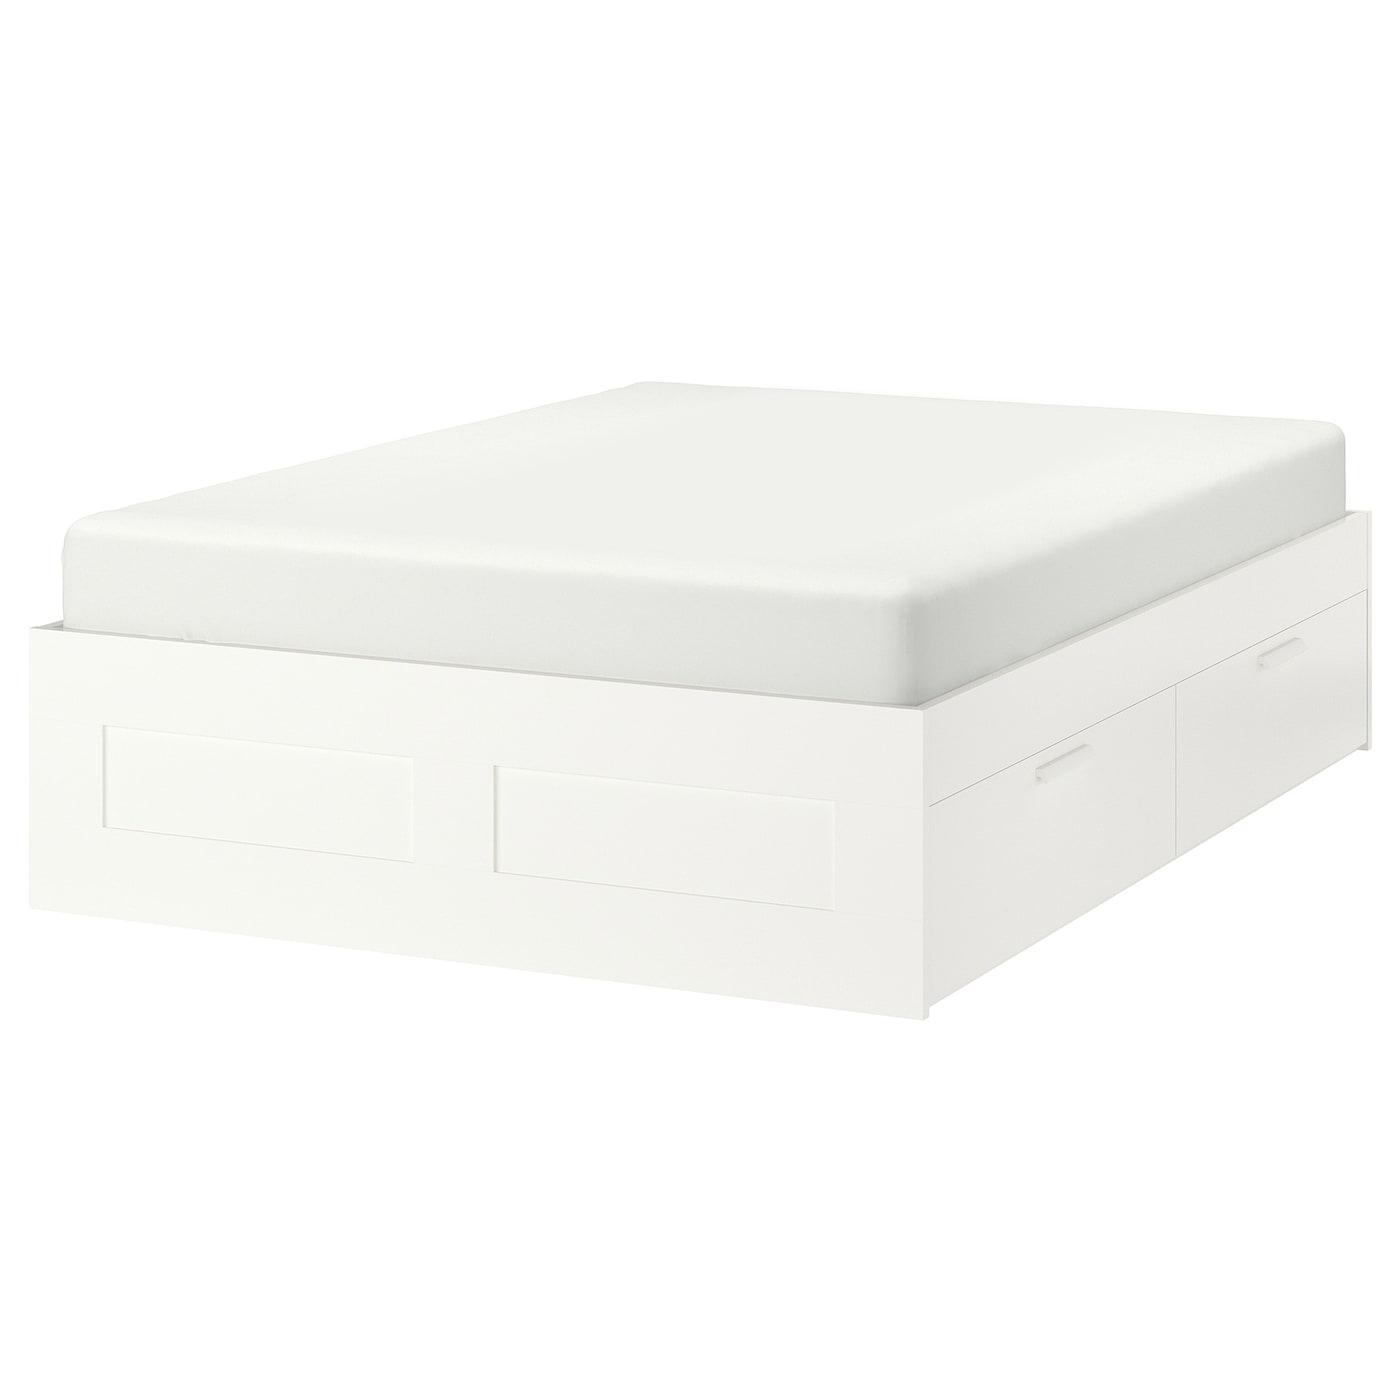 brimnes cadre lit avec rangement blanc 140 x 200 cm ikea. Black Bedroom Furniture Sets. Home Design Ideas